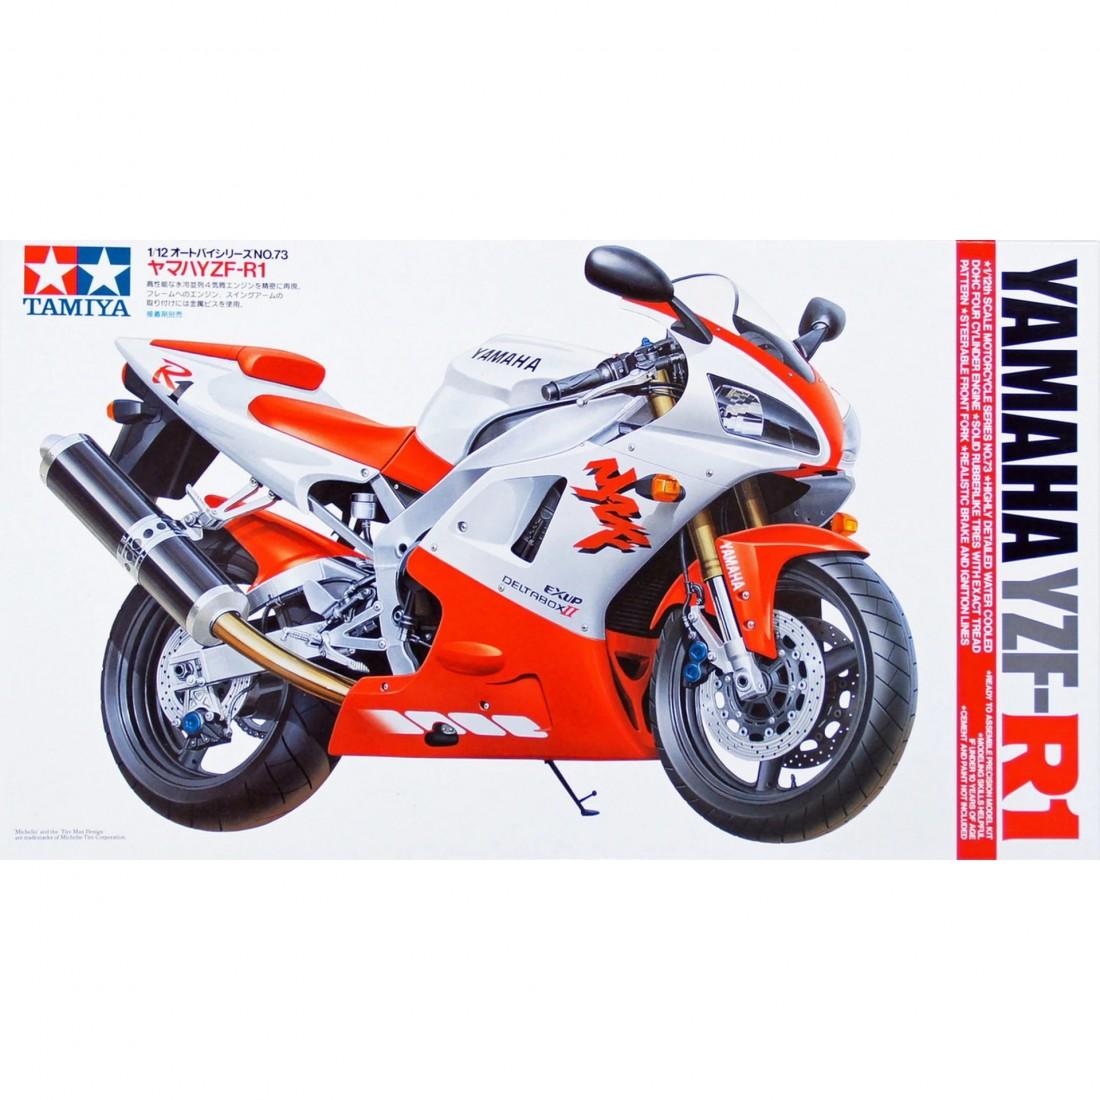 Yamaha YZF-R1 1:12